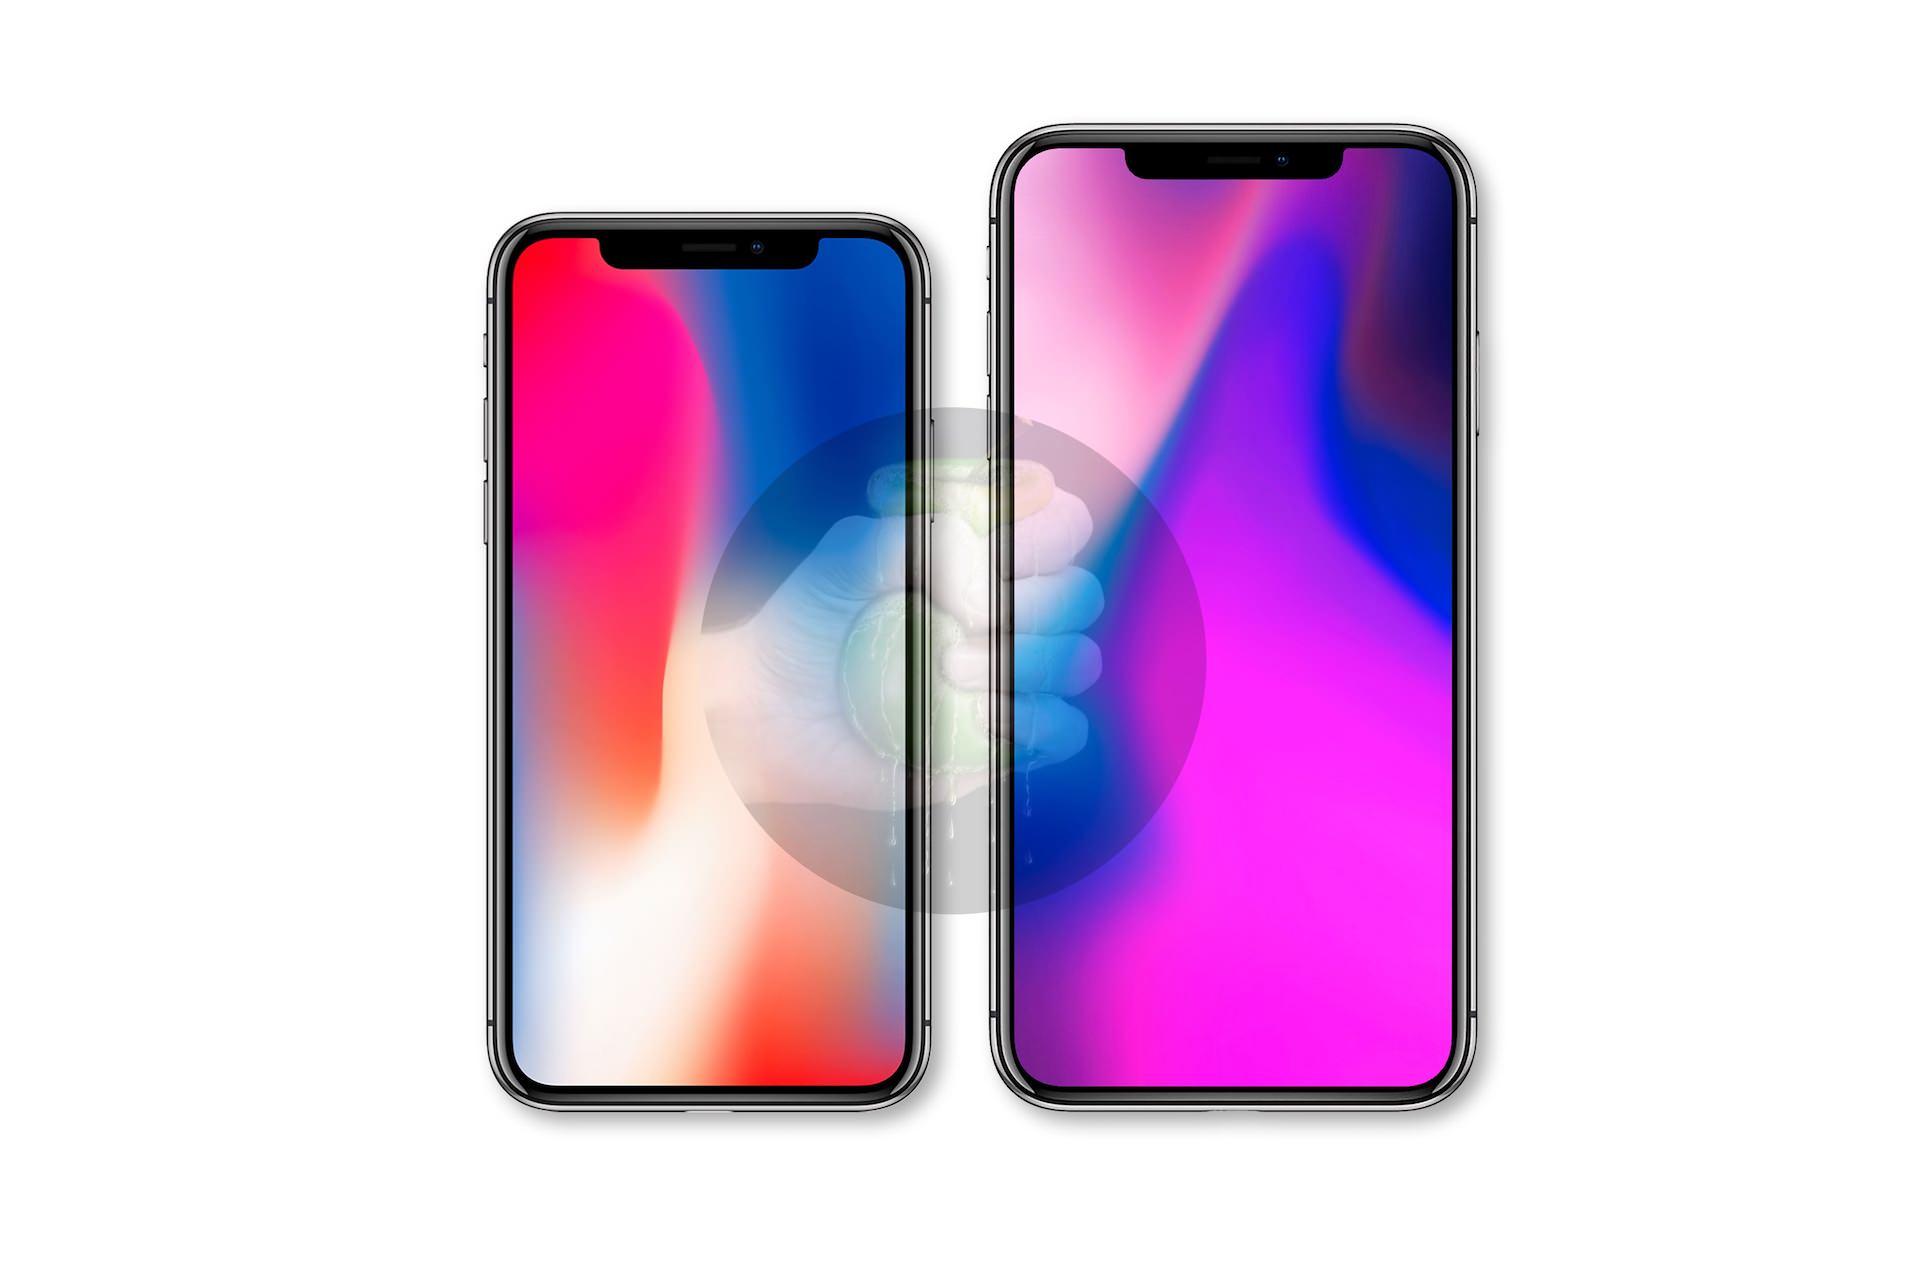 iPhone-9-wylsacom-3